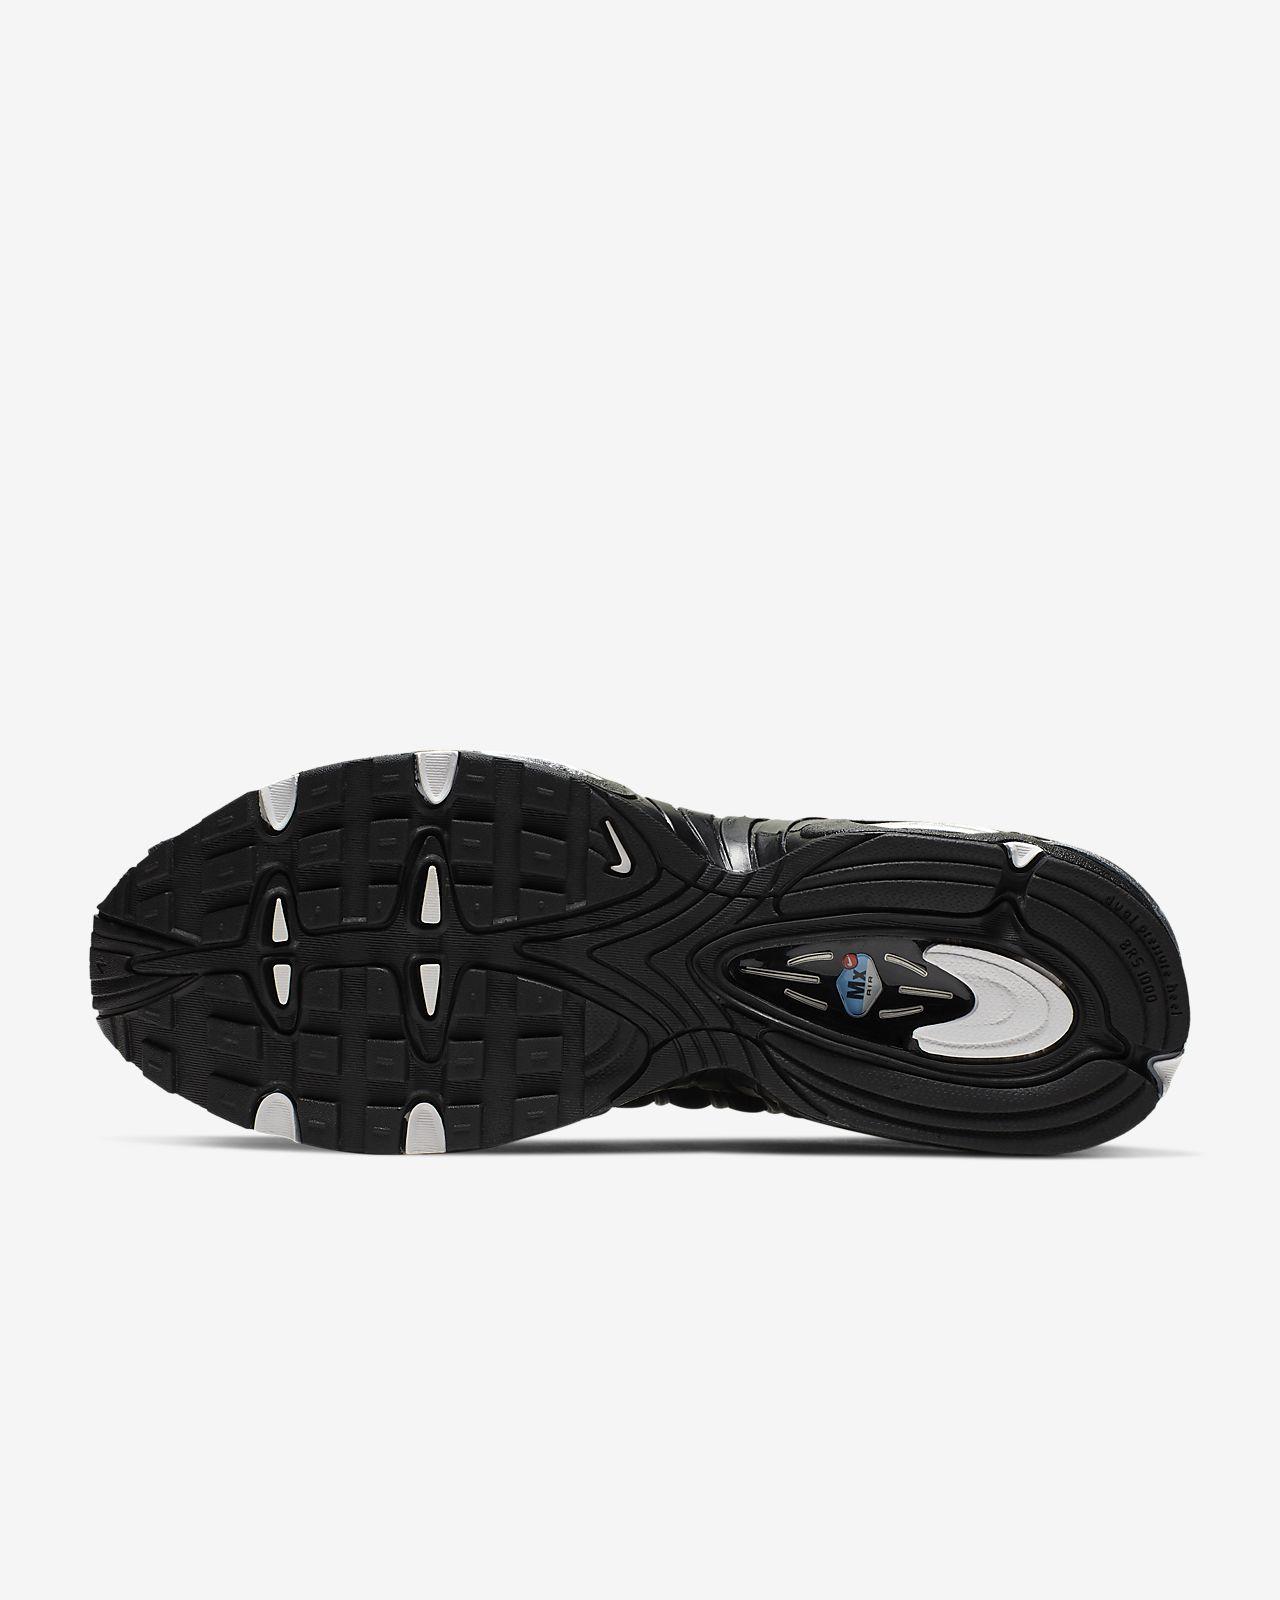 Air IV Tailwind Nike Max Herrenschuh 7gyYbfI6v